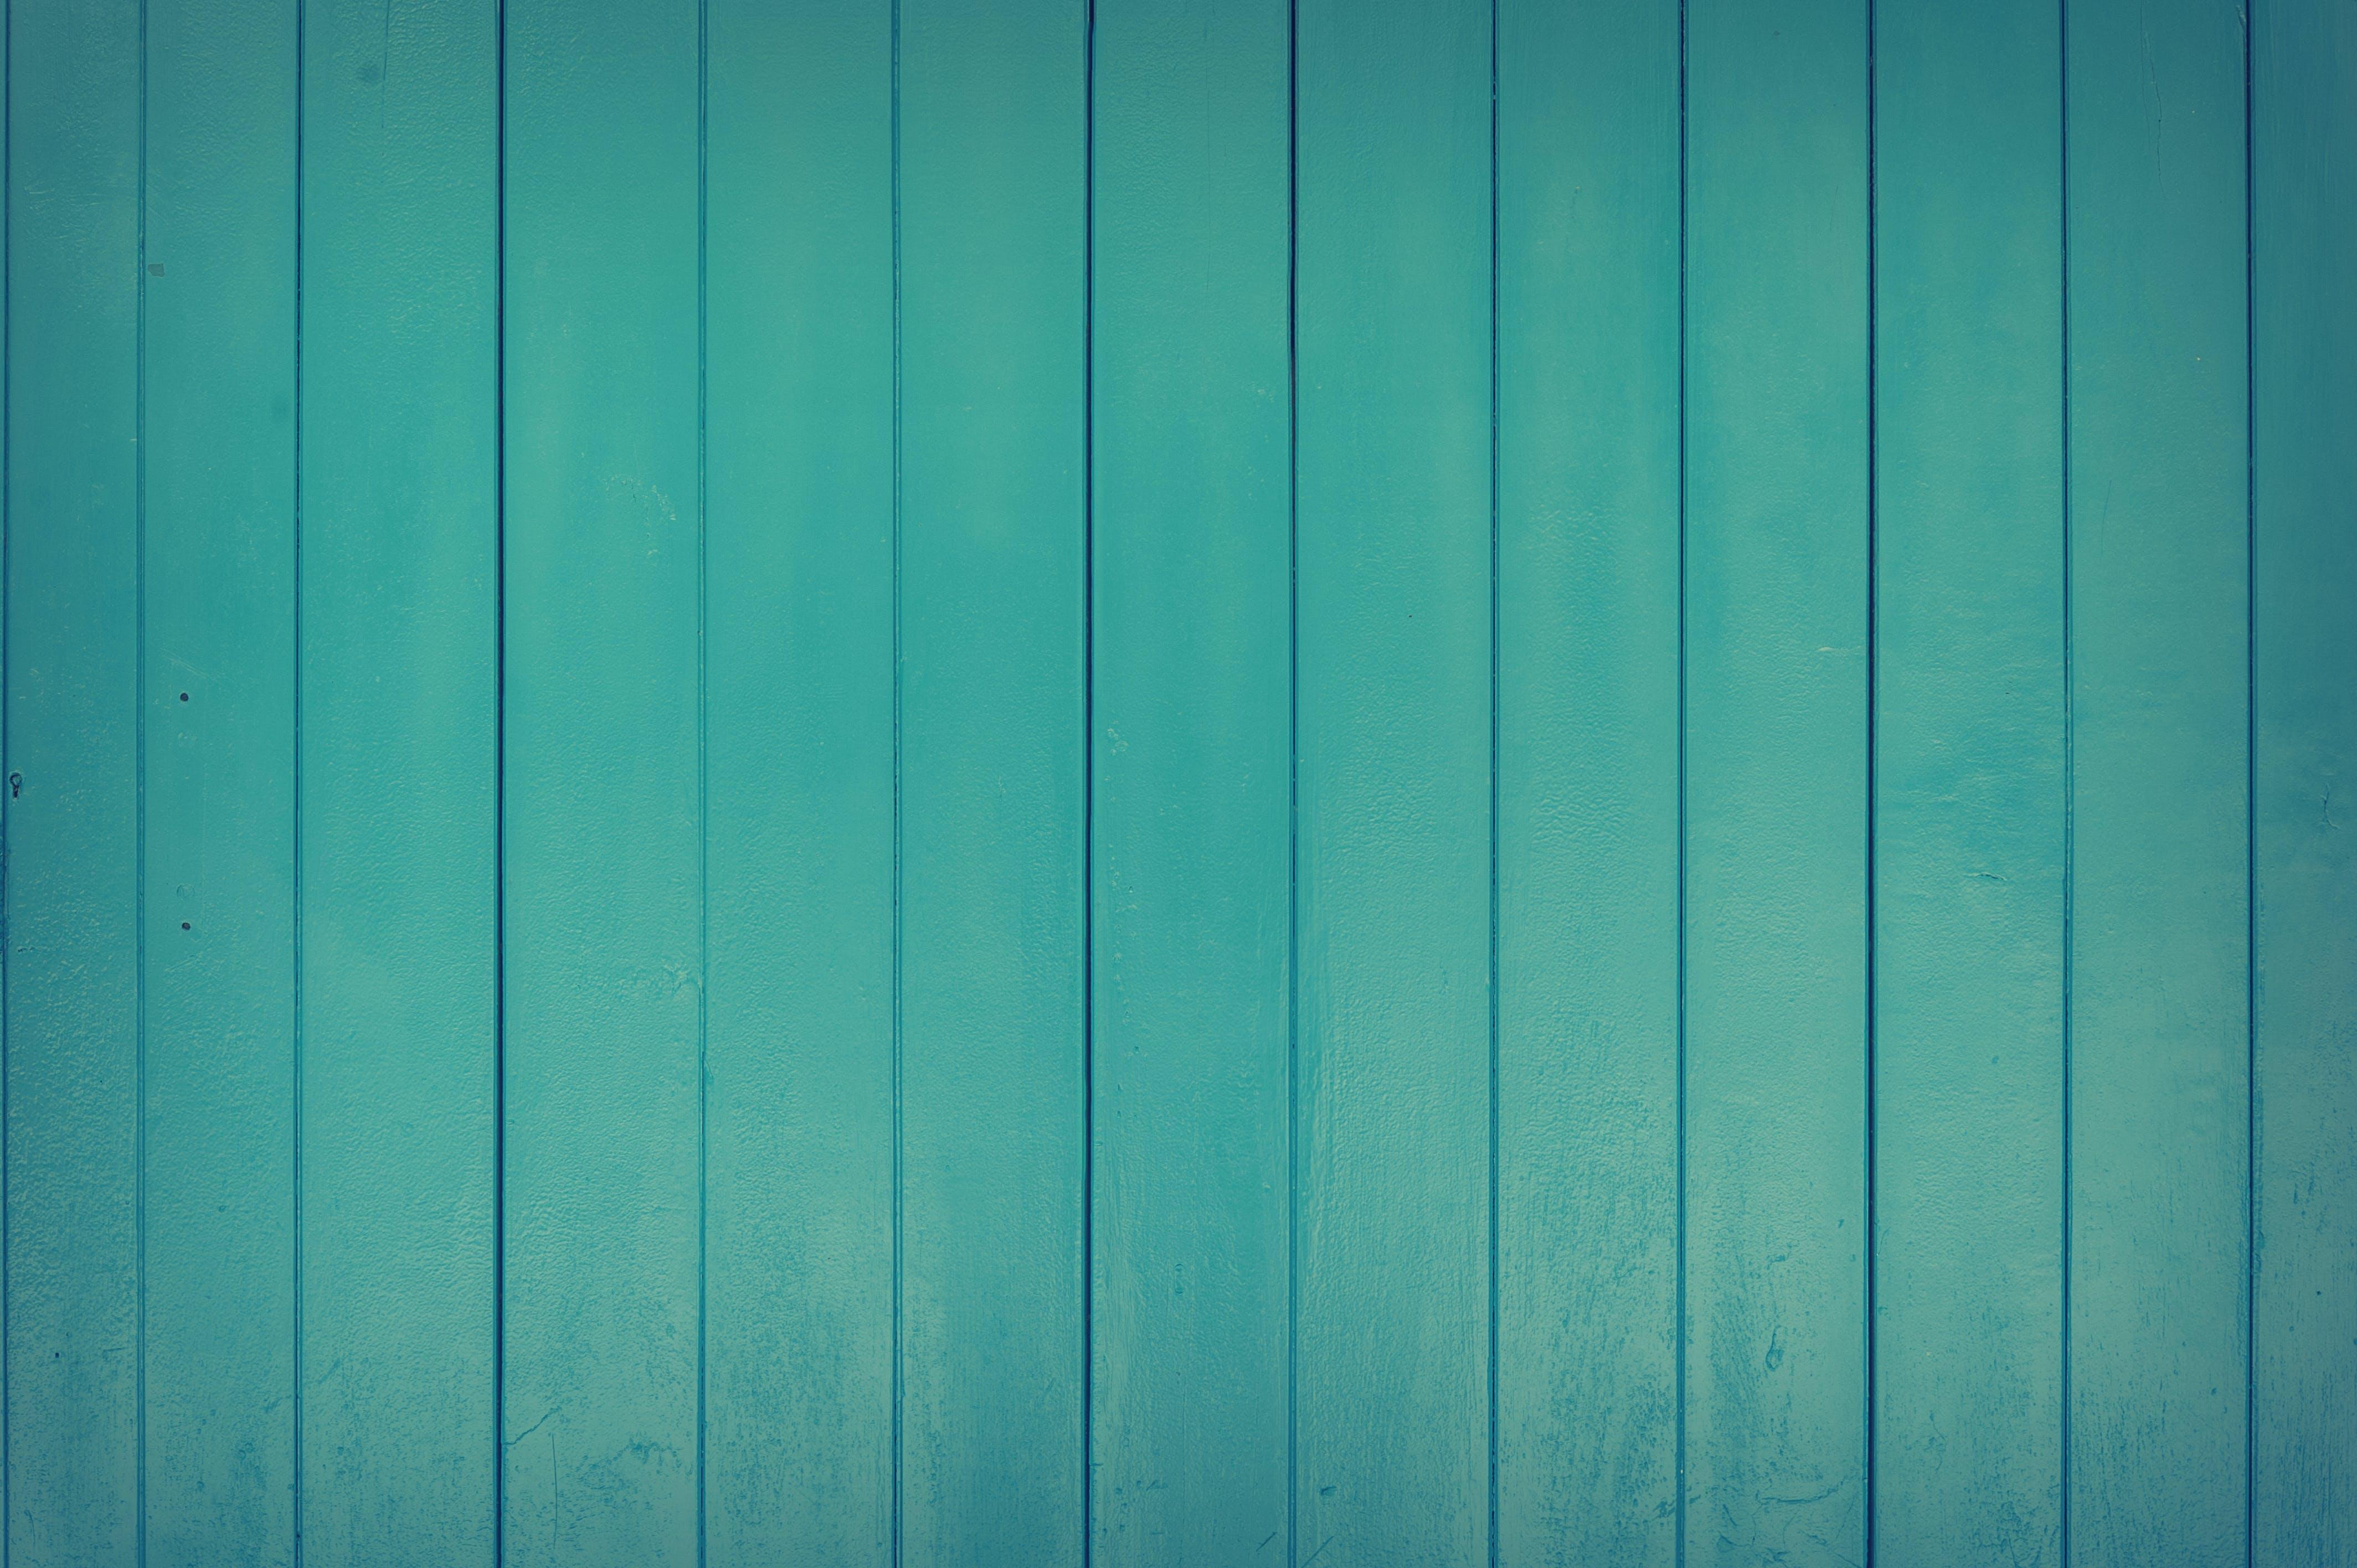 Kostenloses Stock Foto zu grün, holz, mauer, muster